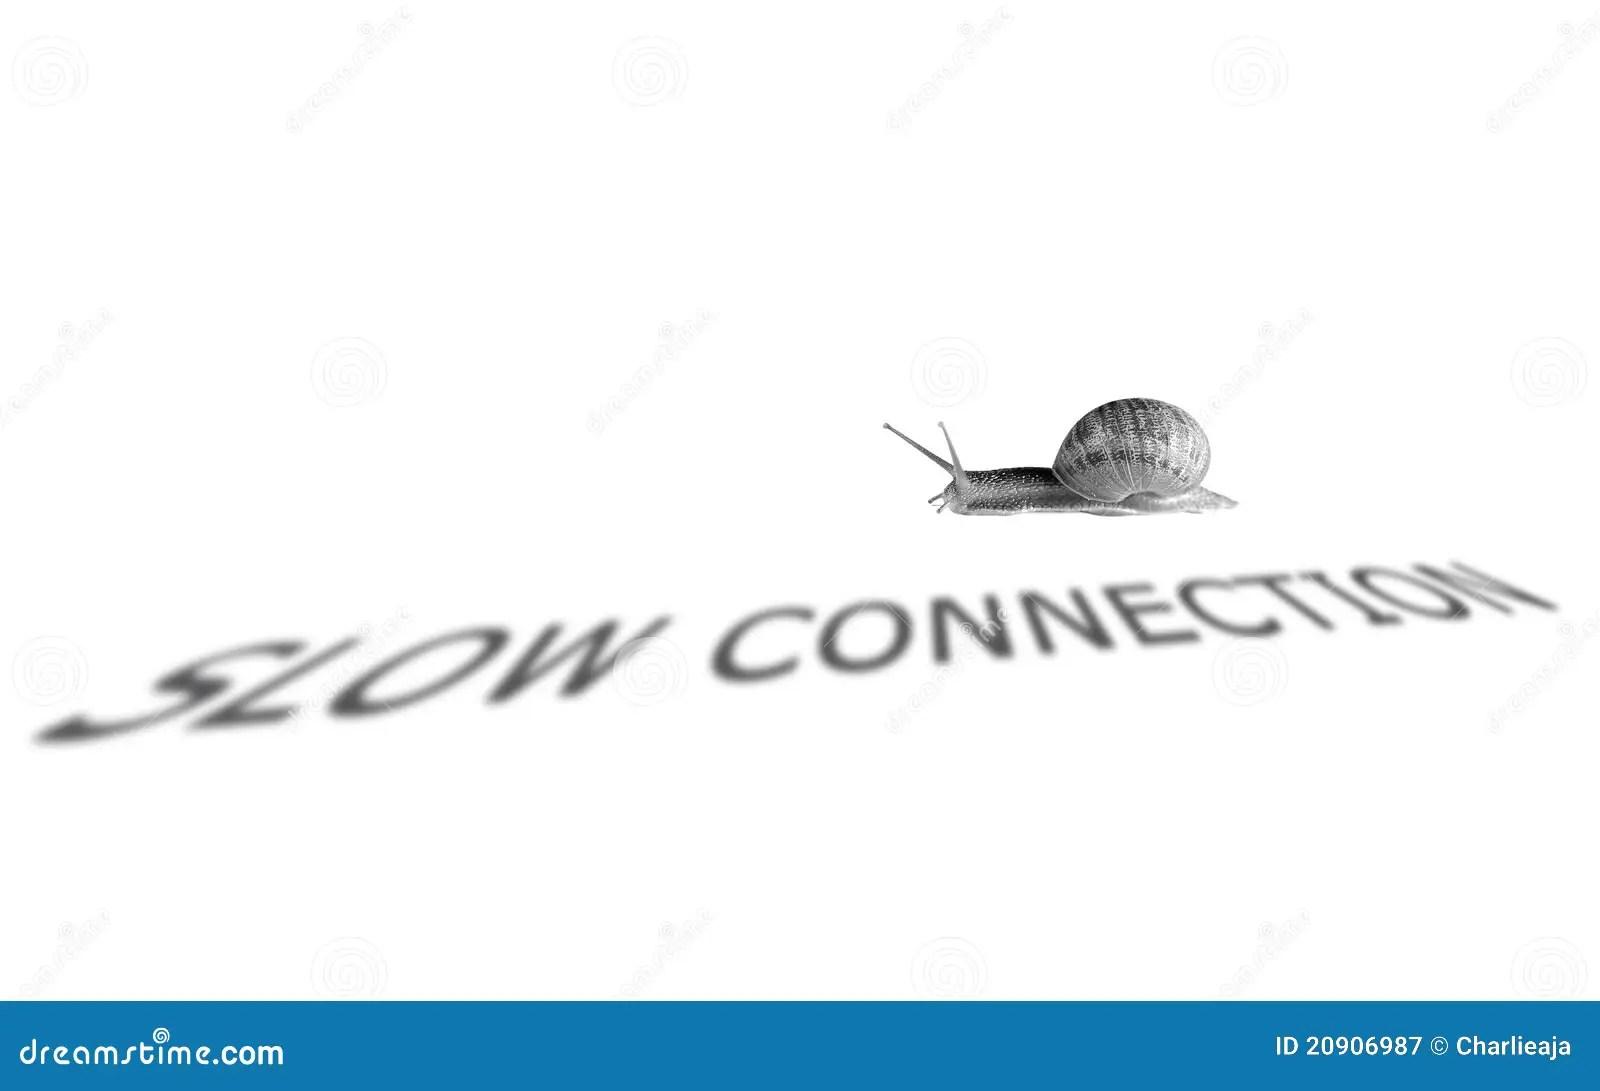 Internet Connection: Internet Connection Is Slow